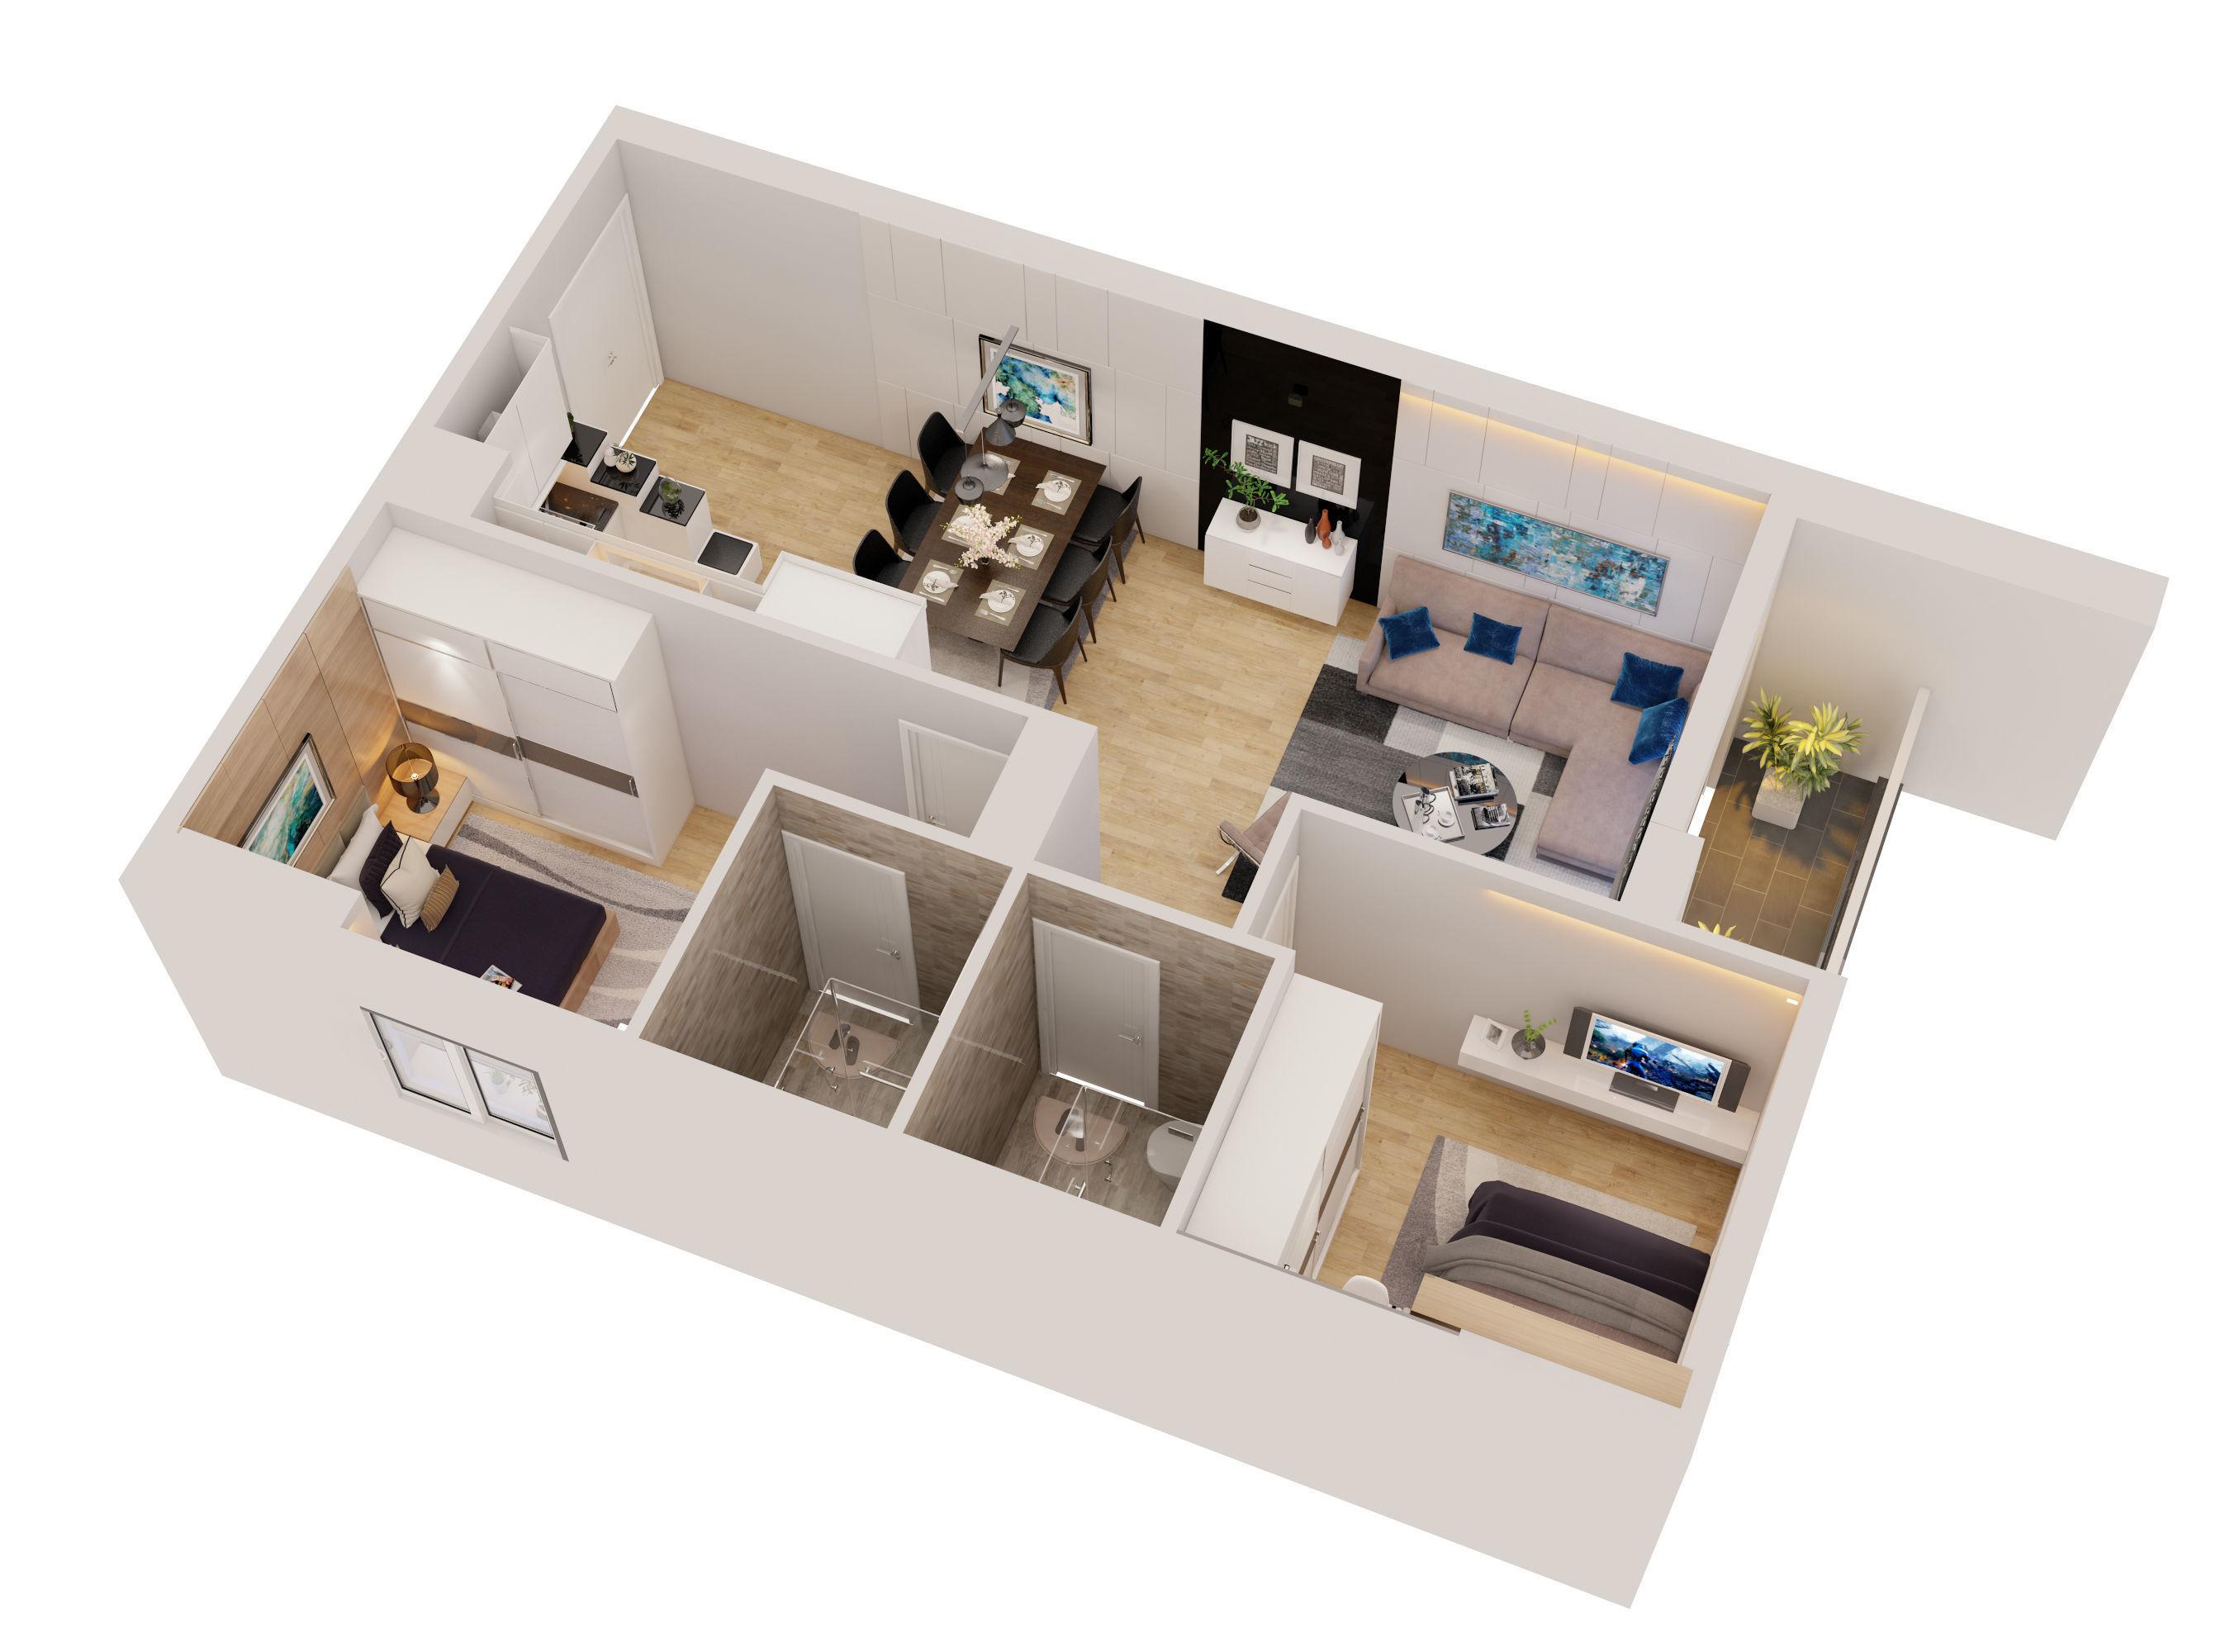 Cutaway apartment full furnitures in modern design 3D model   3D model